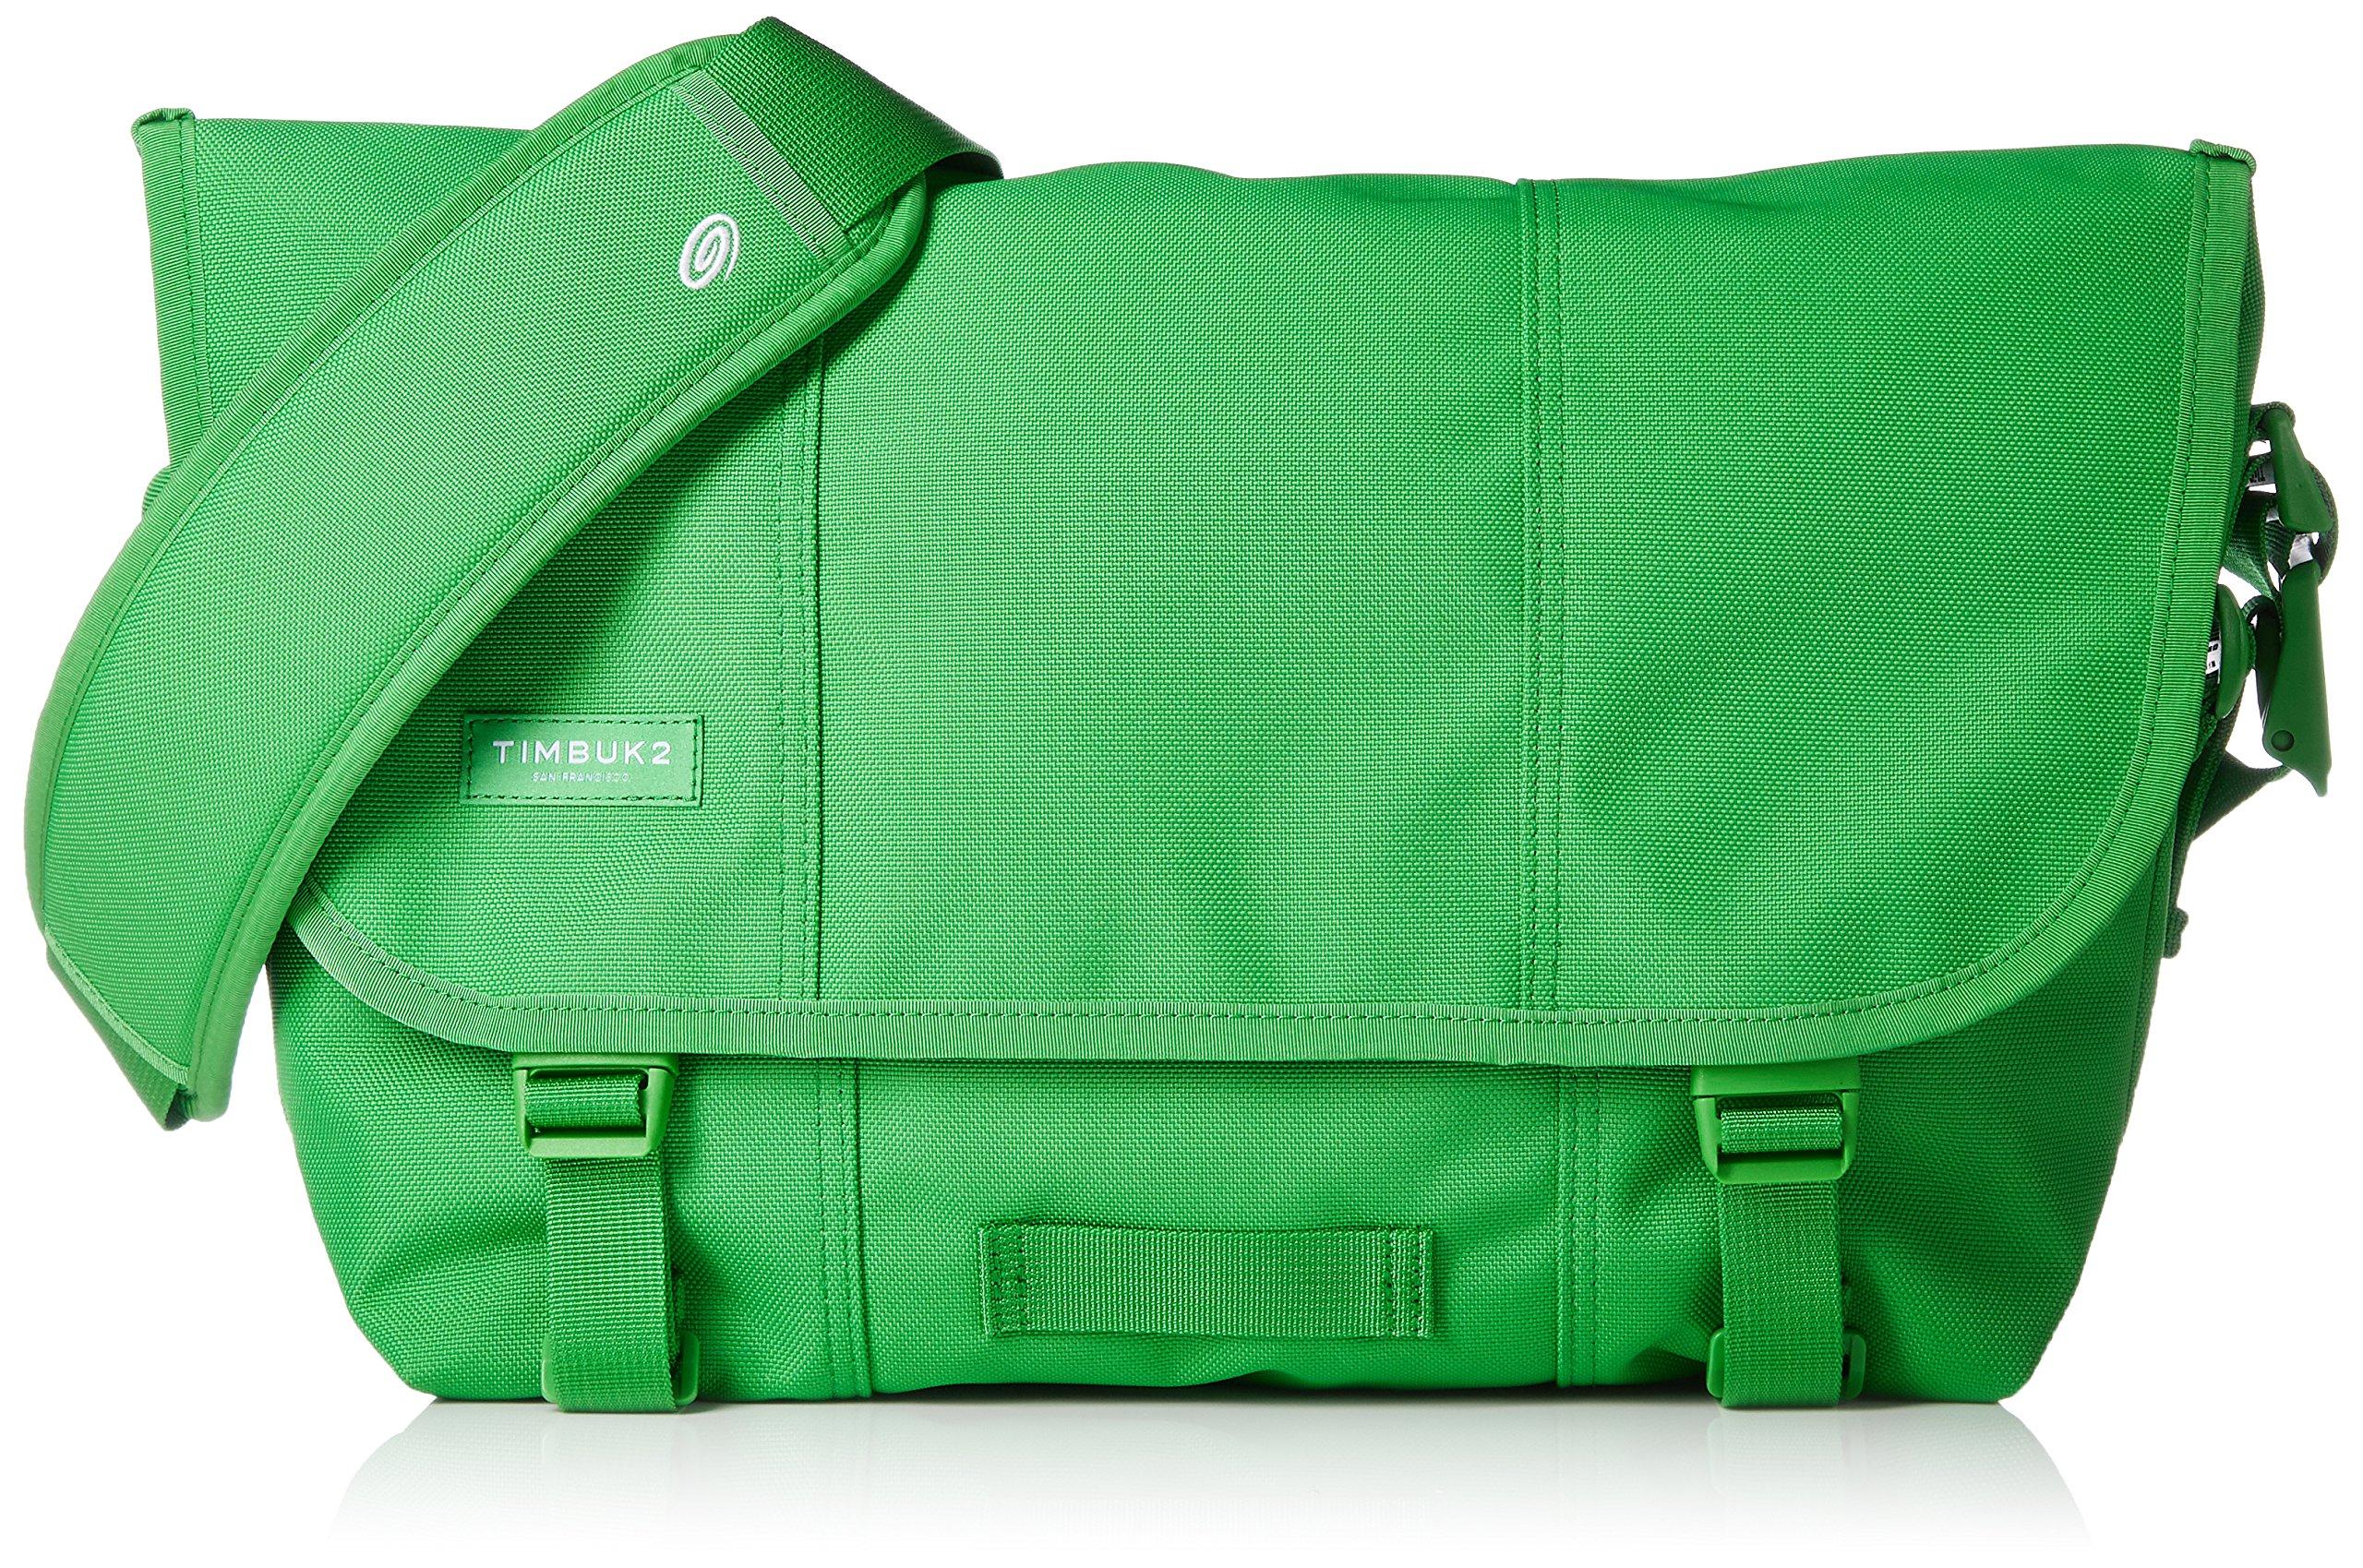 Timbuk2 Classic 2013 Messenger Bag